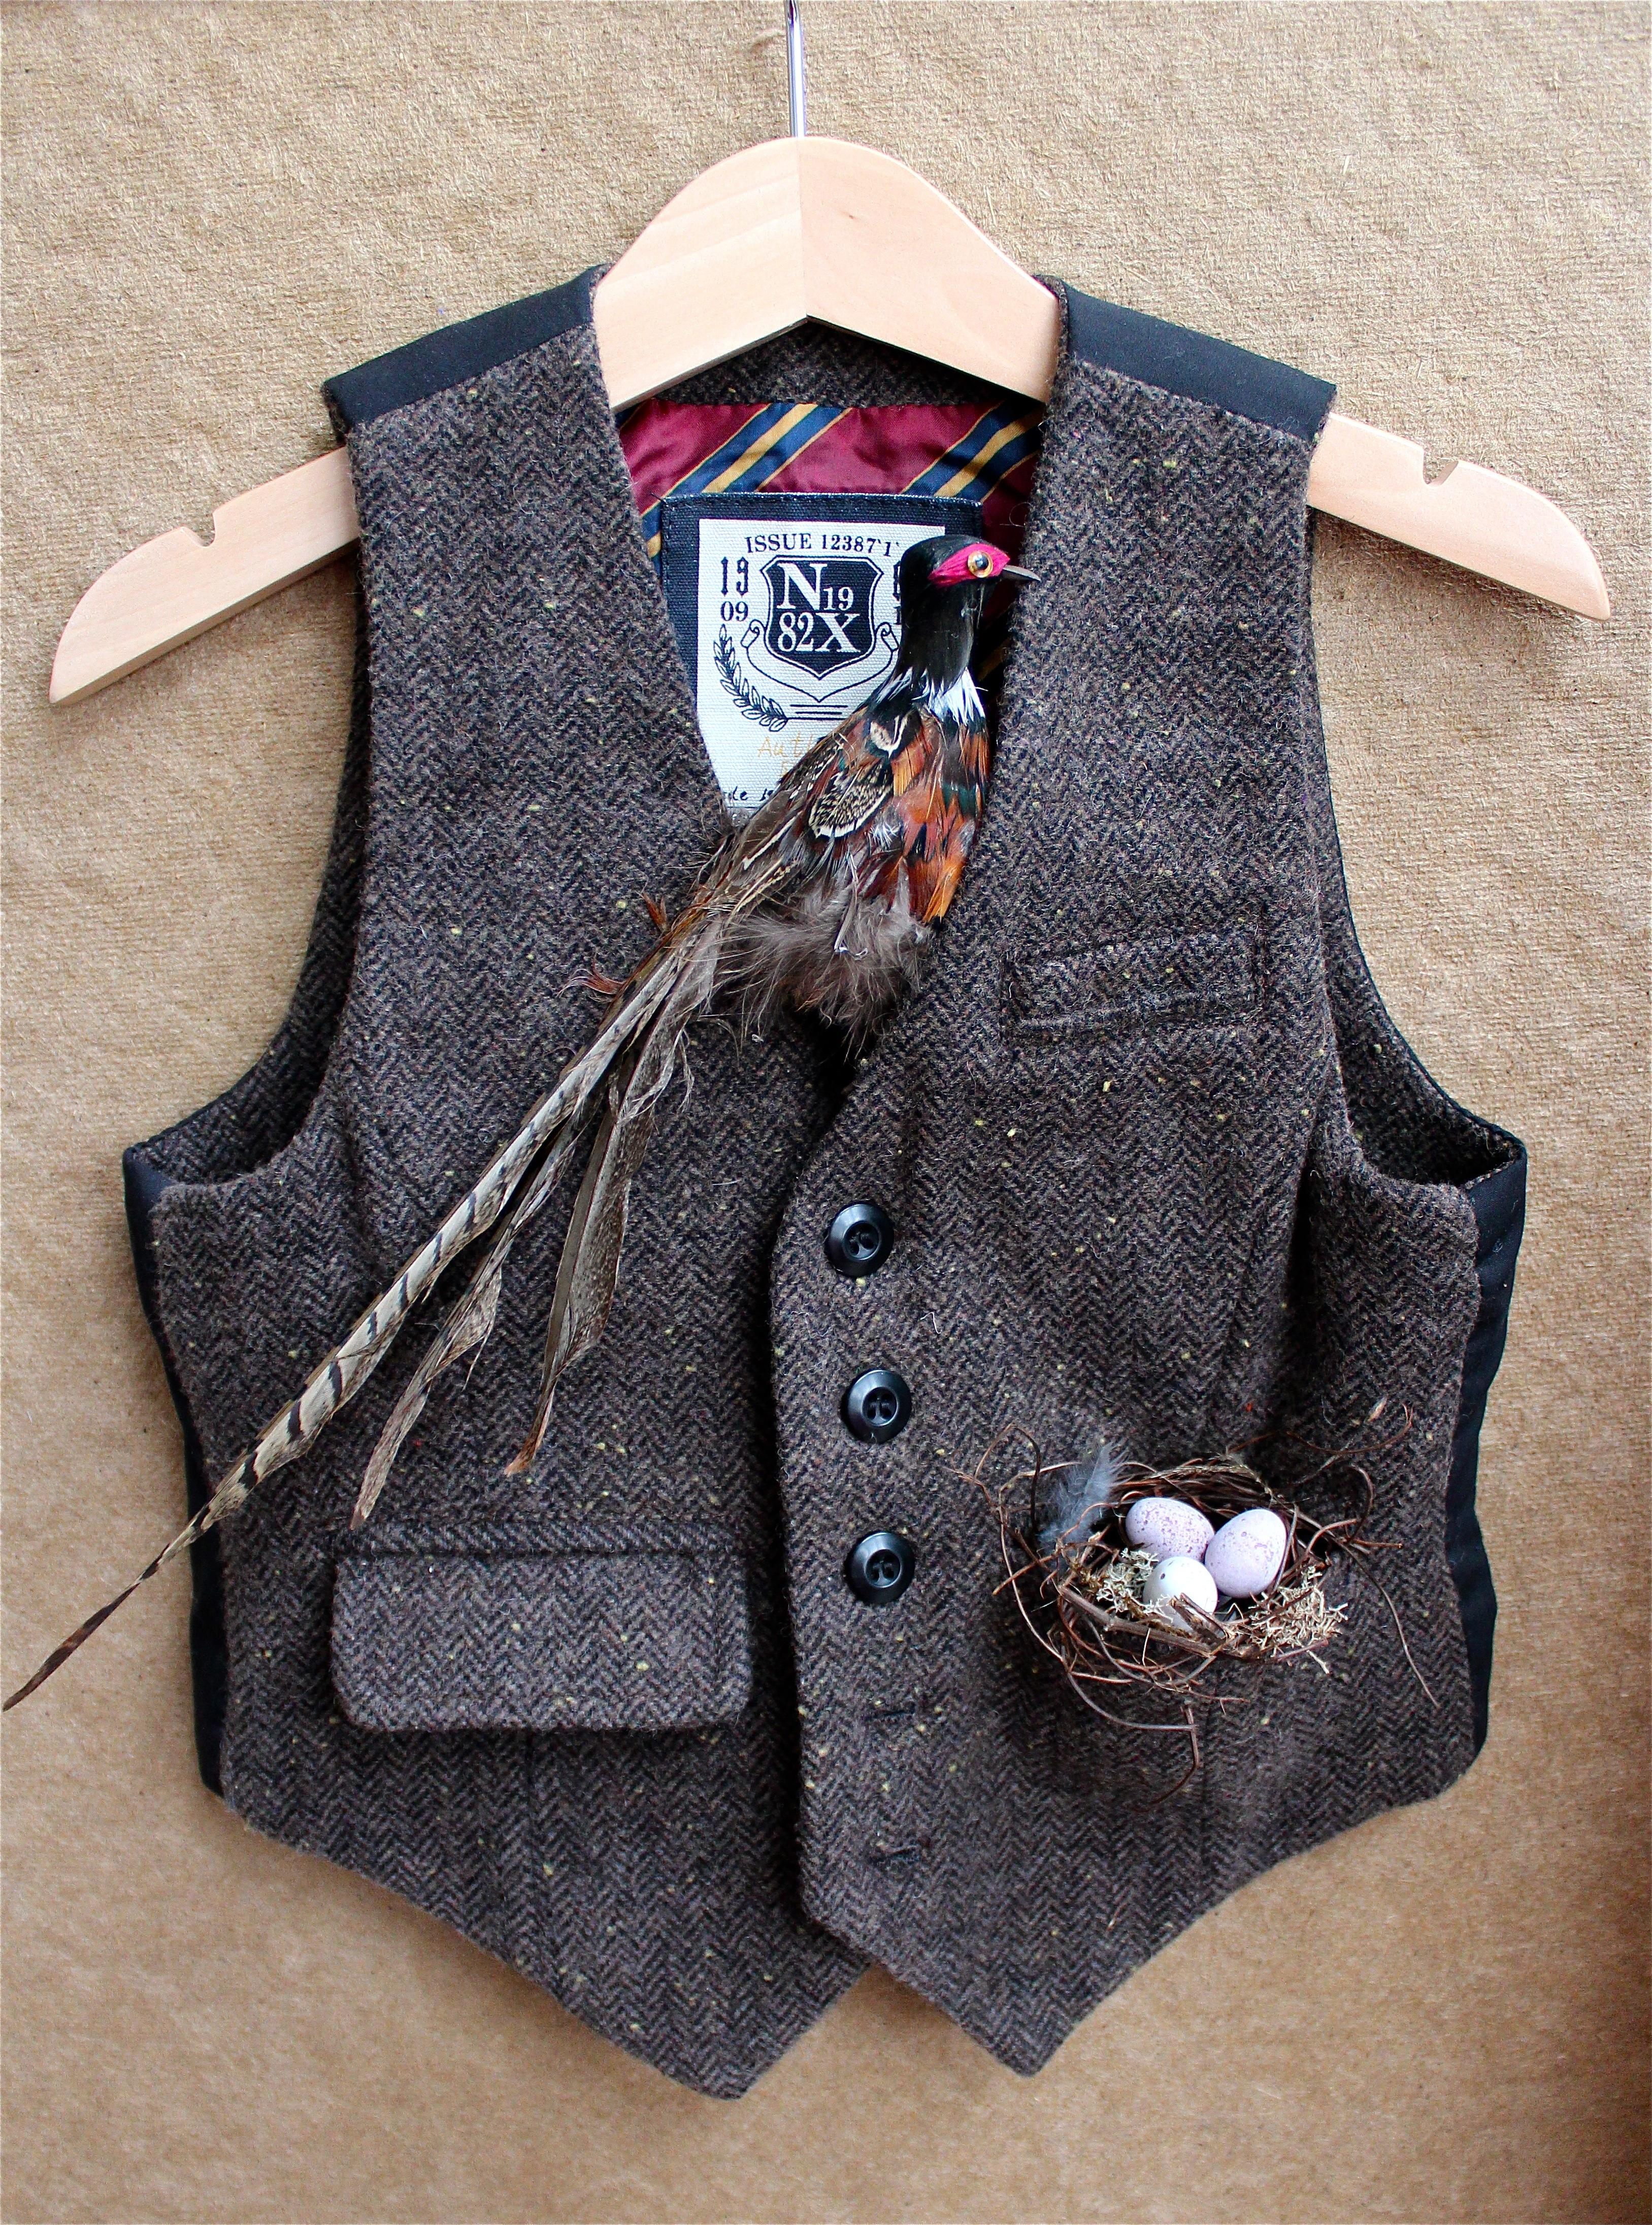 bird nest in waistcoat pocket